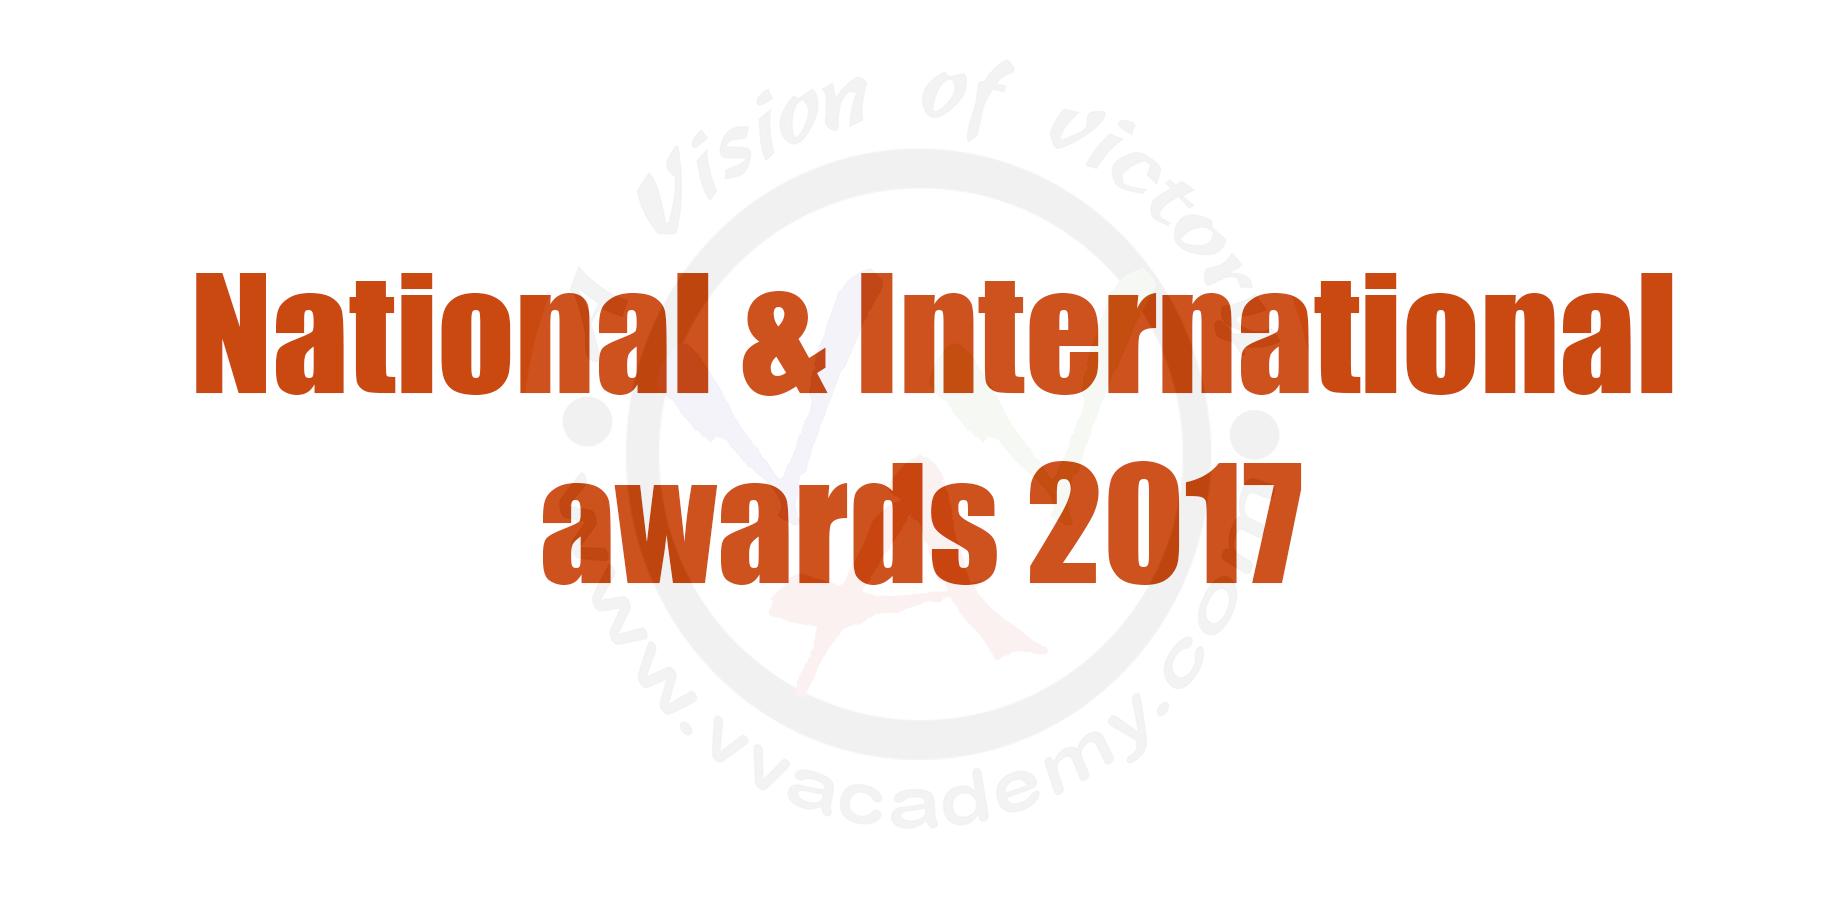 National & International awards 2017